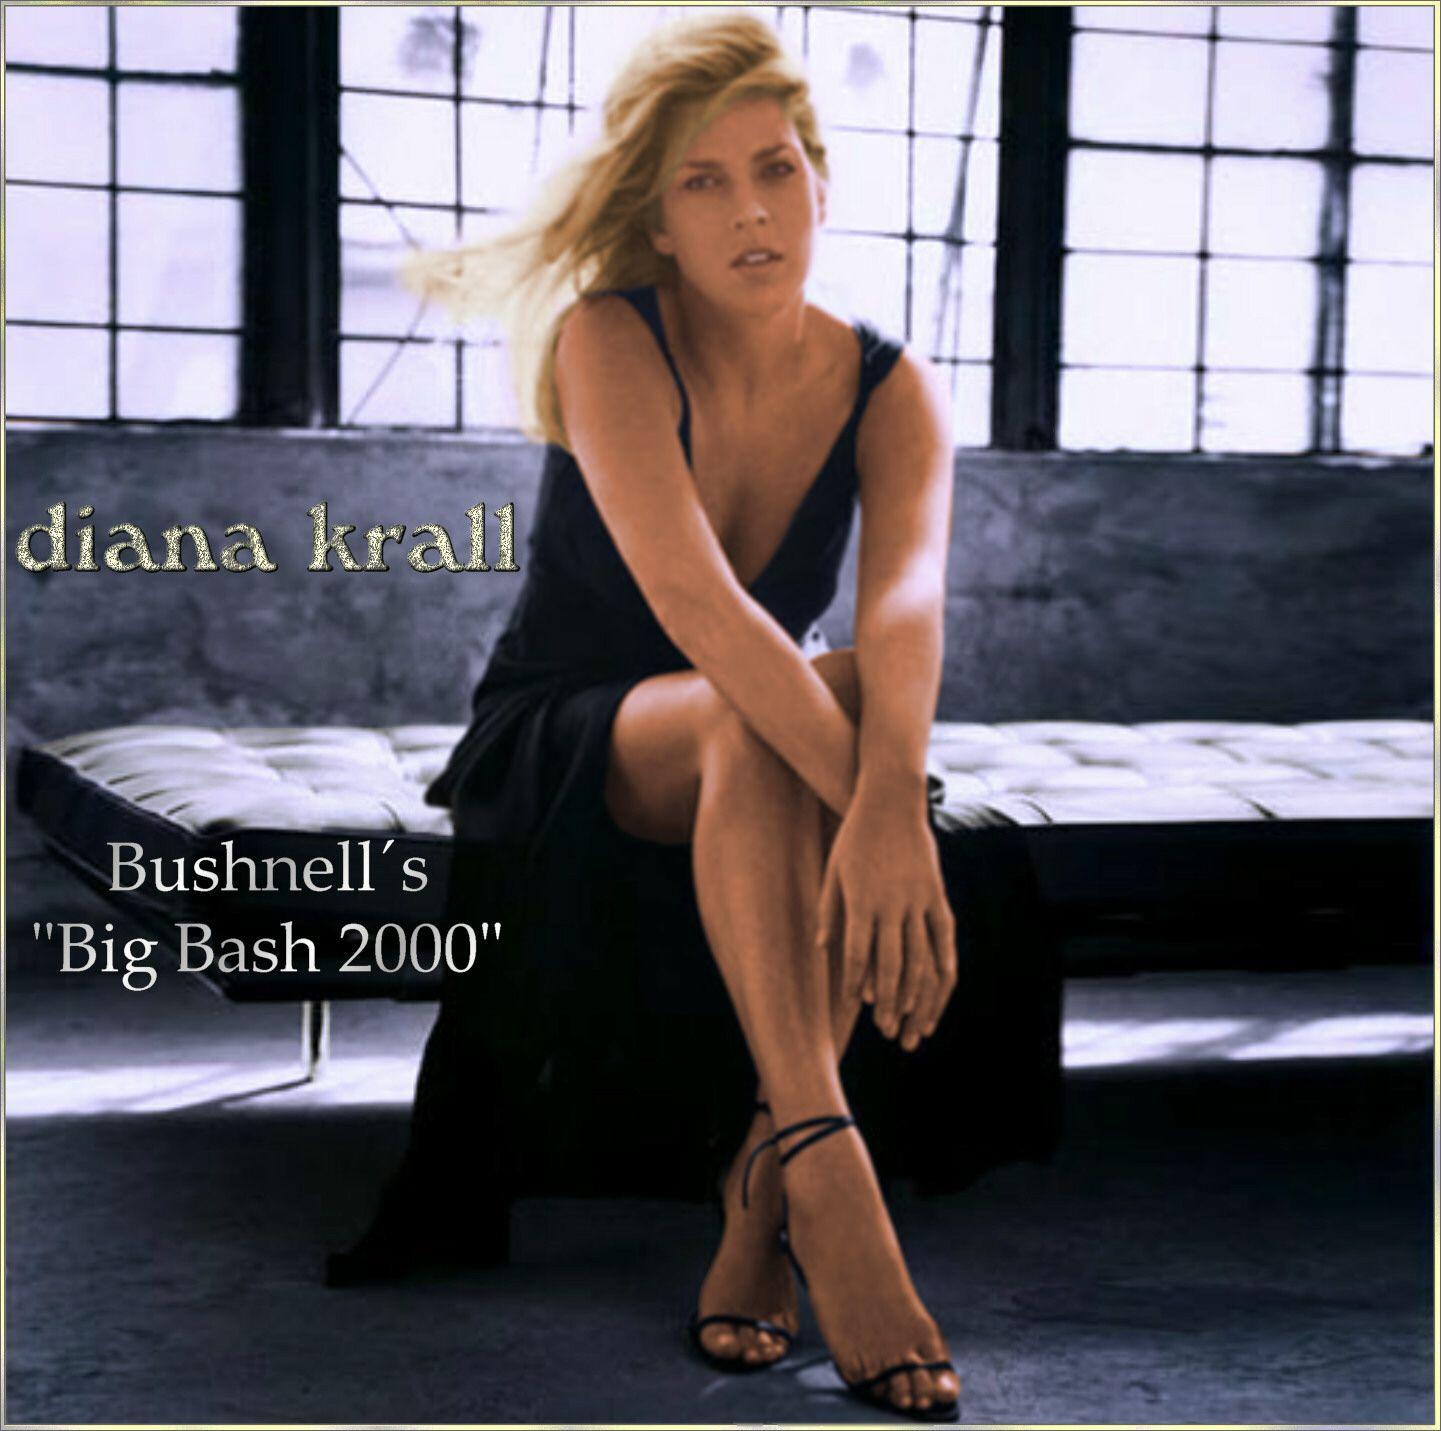 Diana krall boulevard of broken dreams перевод